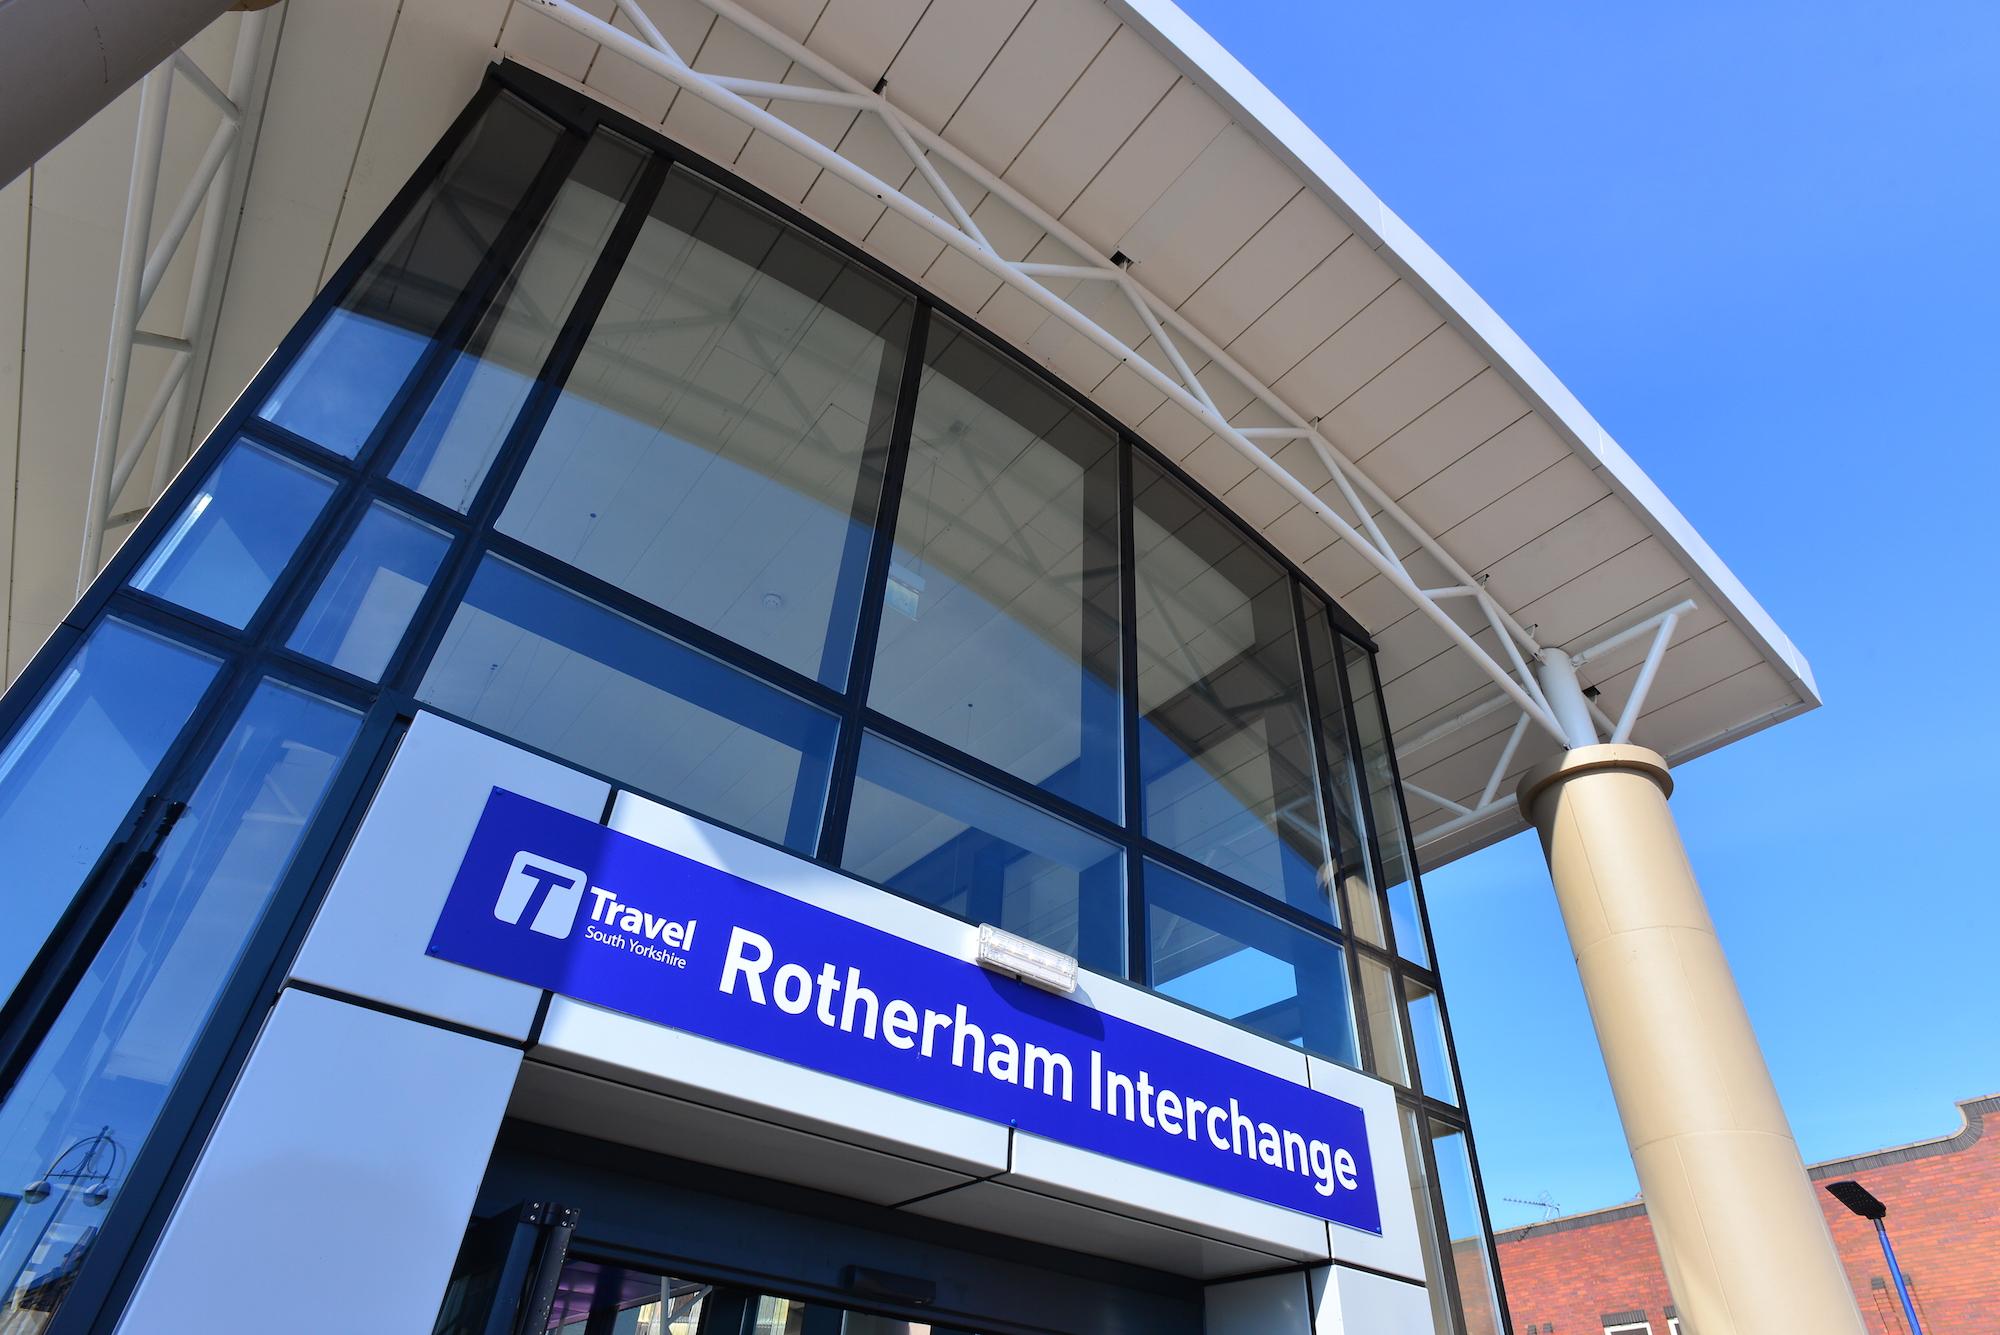 Single nights rotherham